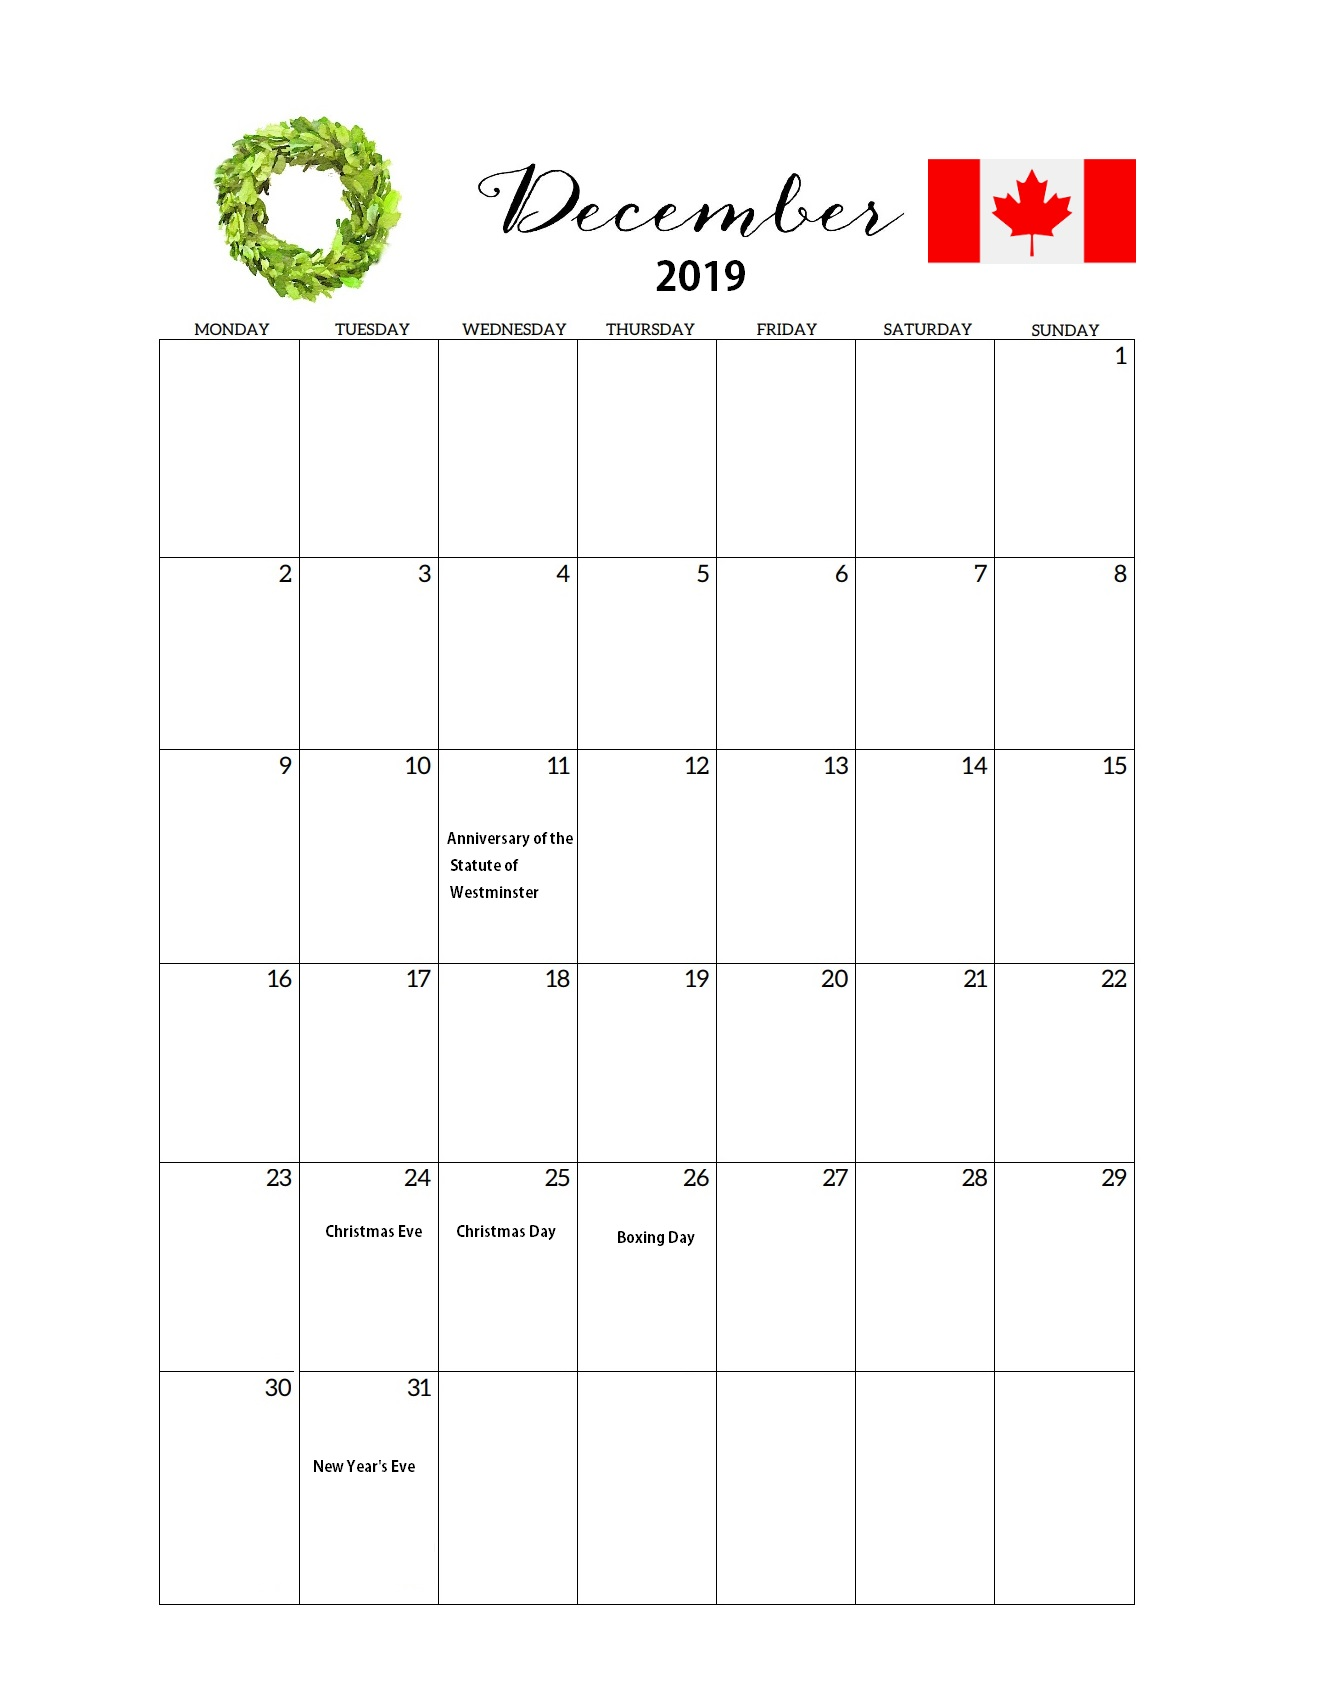 Canada December 2019 Federal Holidays Calendar